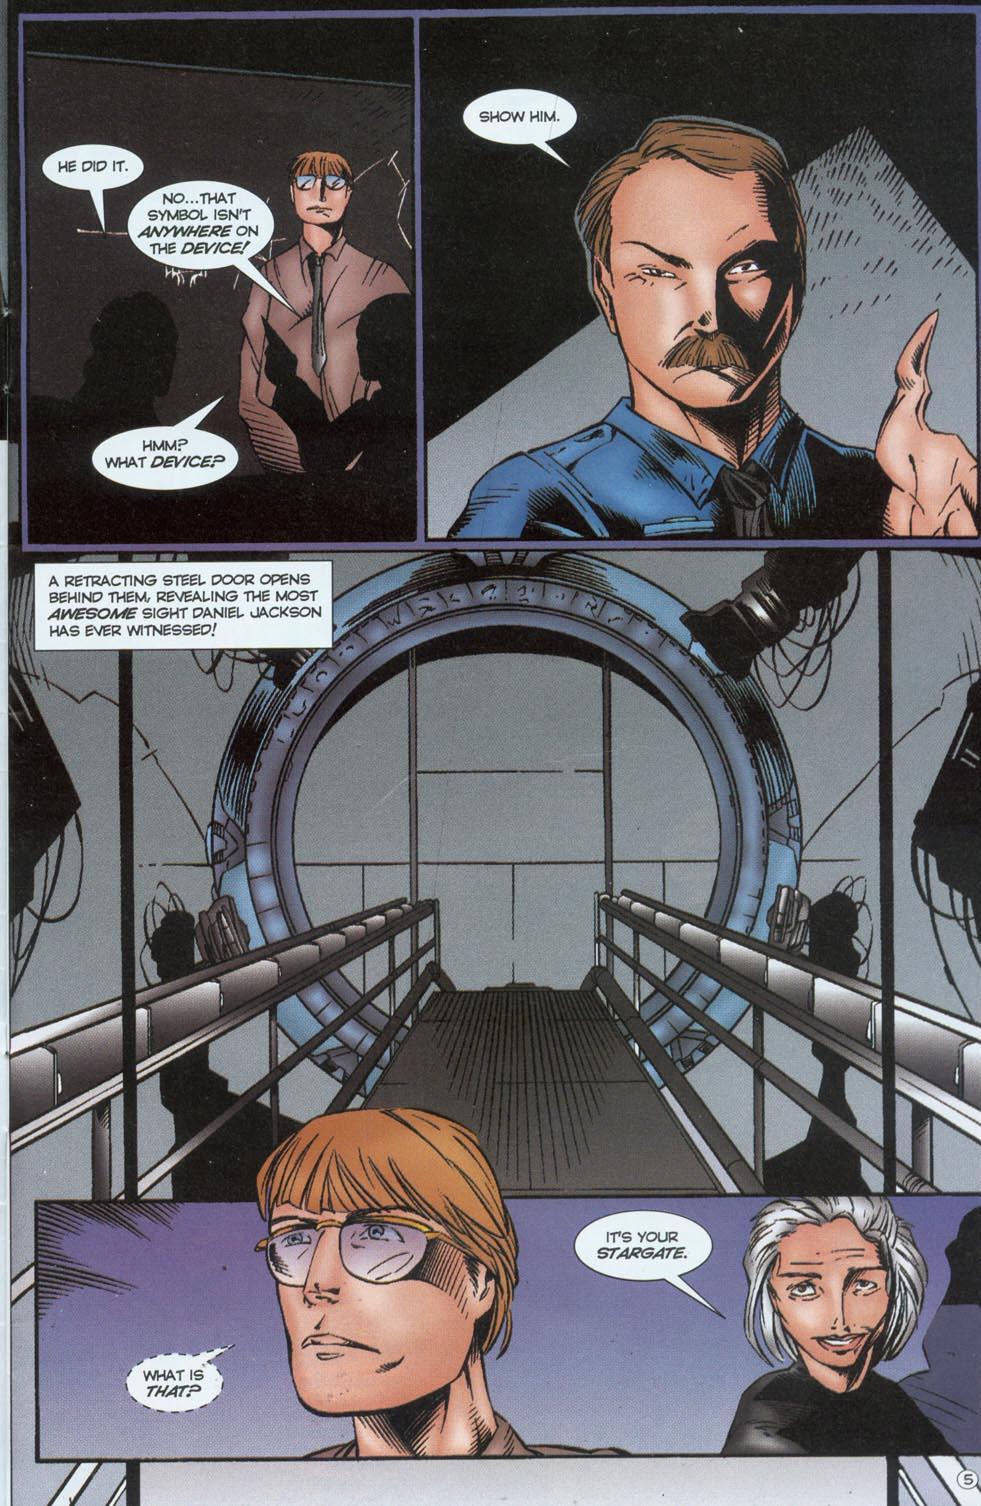 Read online Stargate comic -  Issue #1 - 7